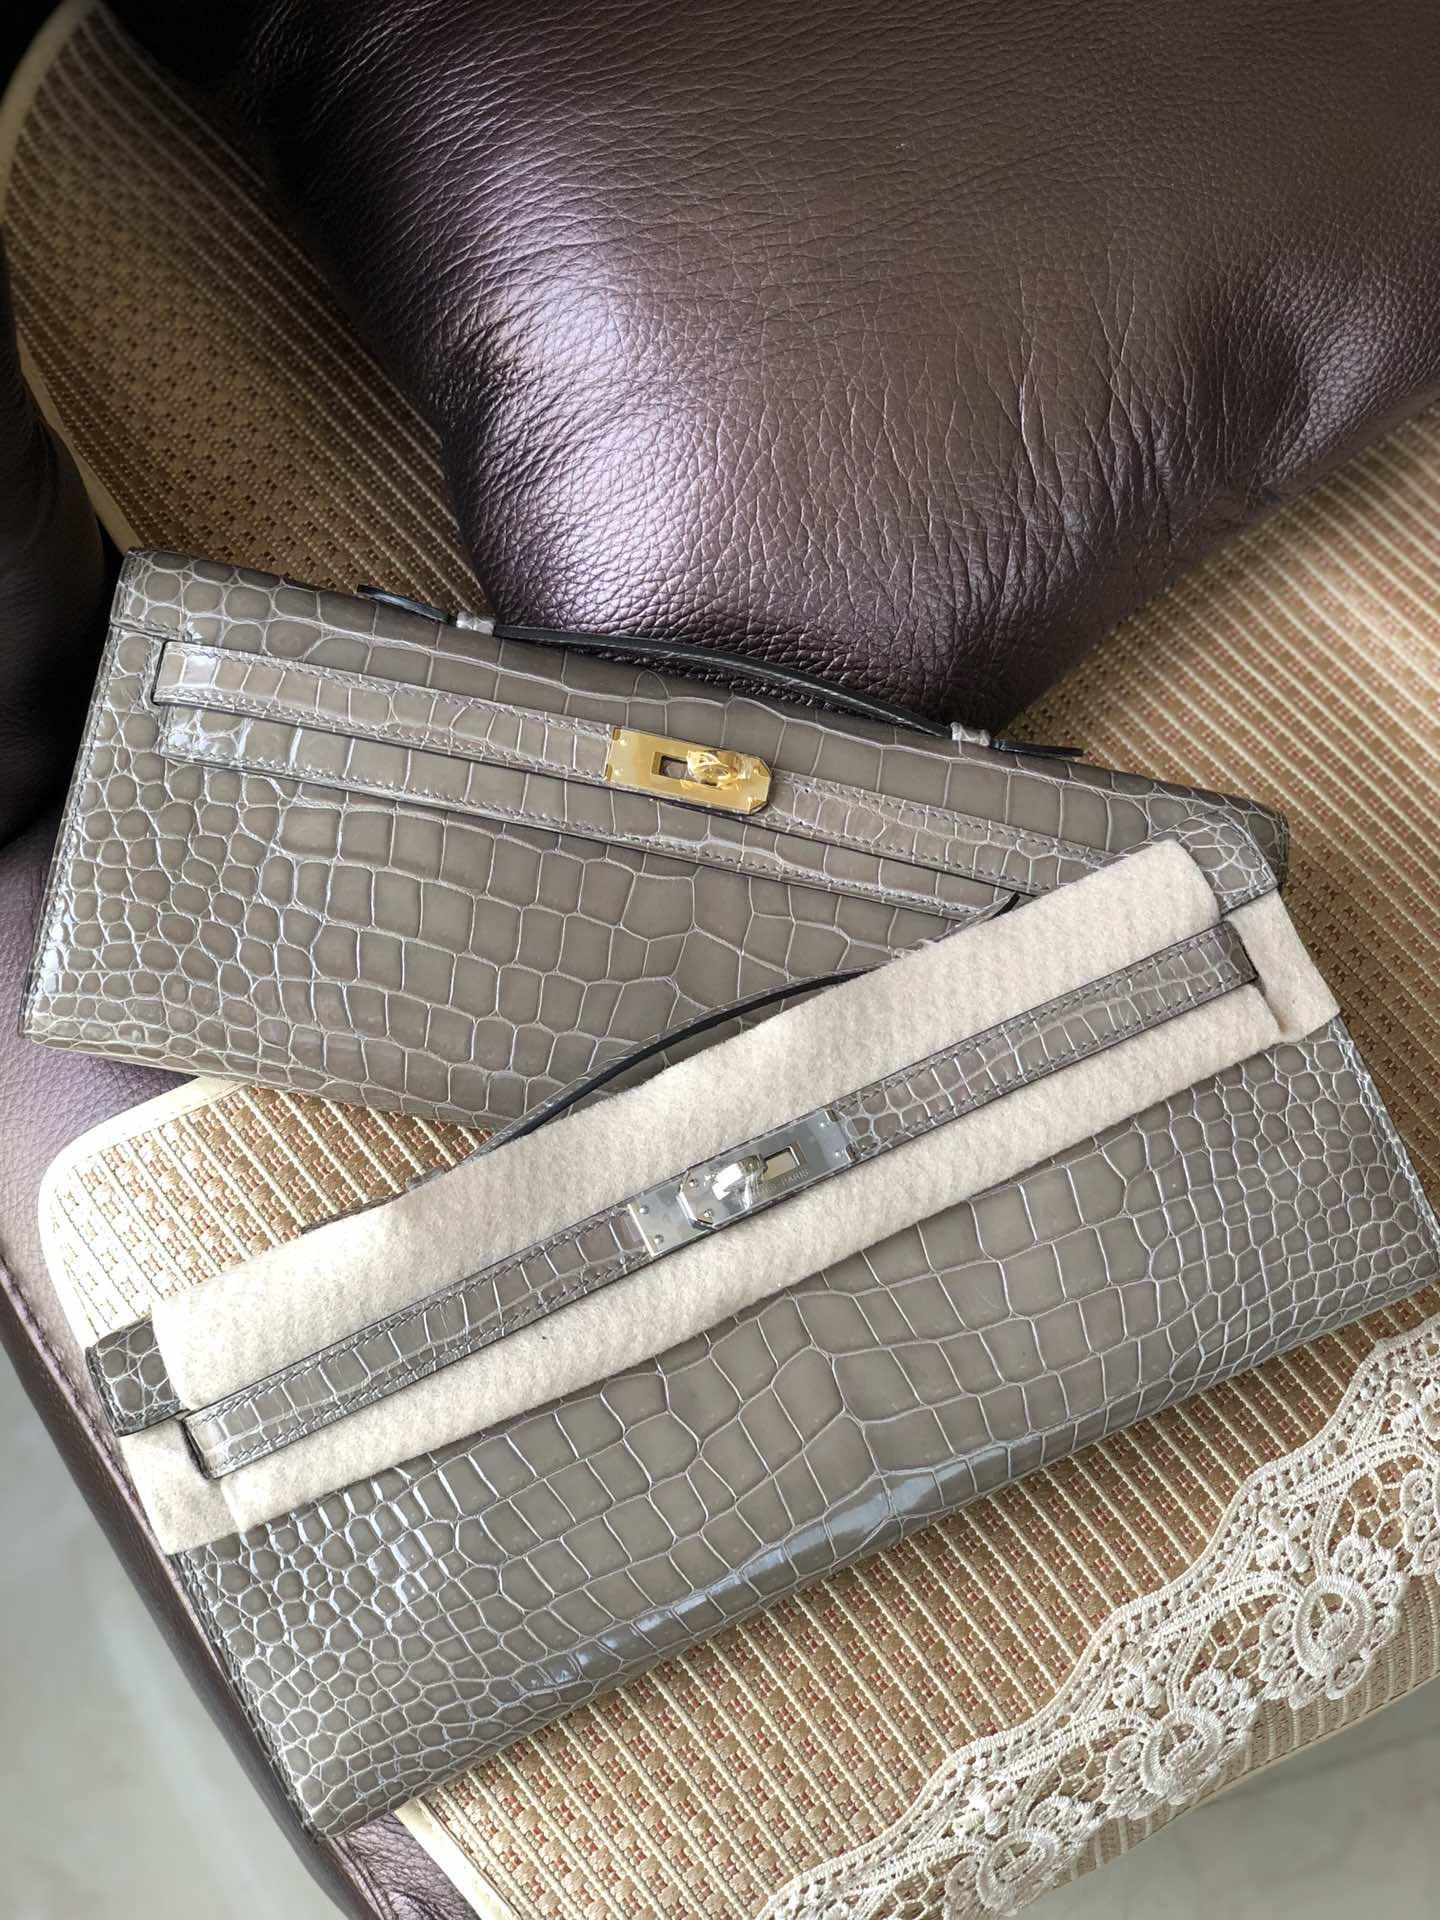 Stock Hermes CK81 Gris T Shiny Crocodile Kelly Cut Clutch Bag Gold/Silver Hardware